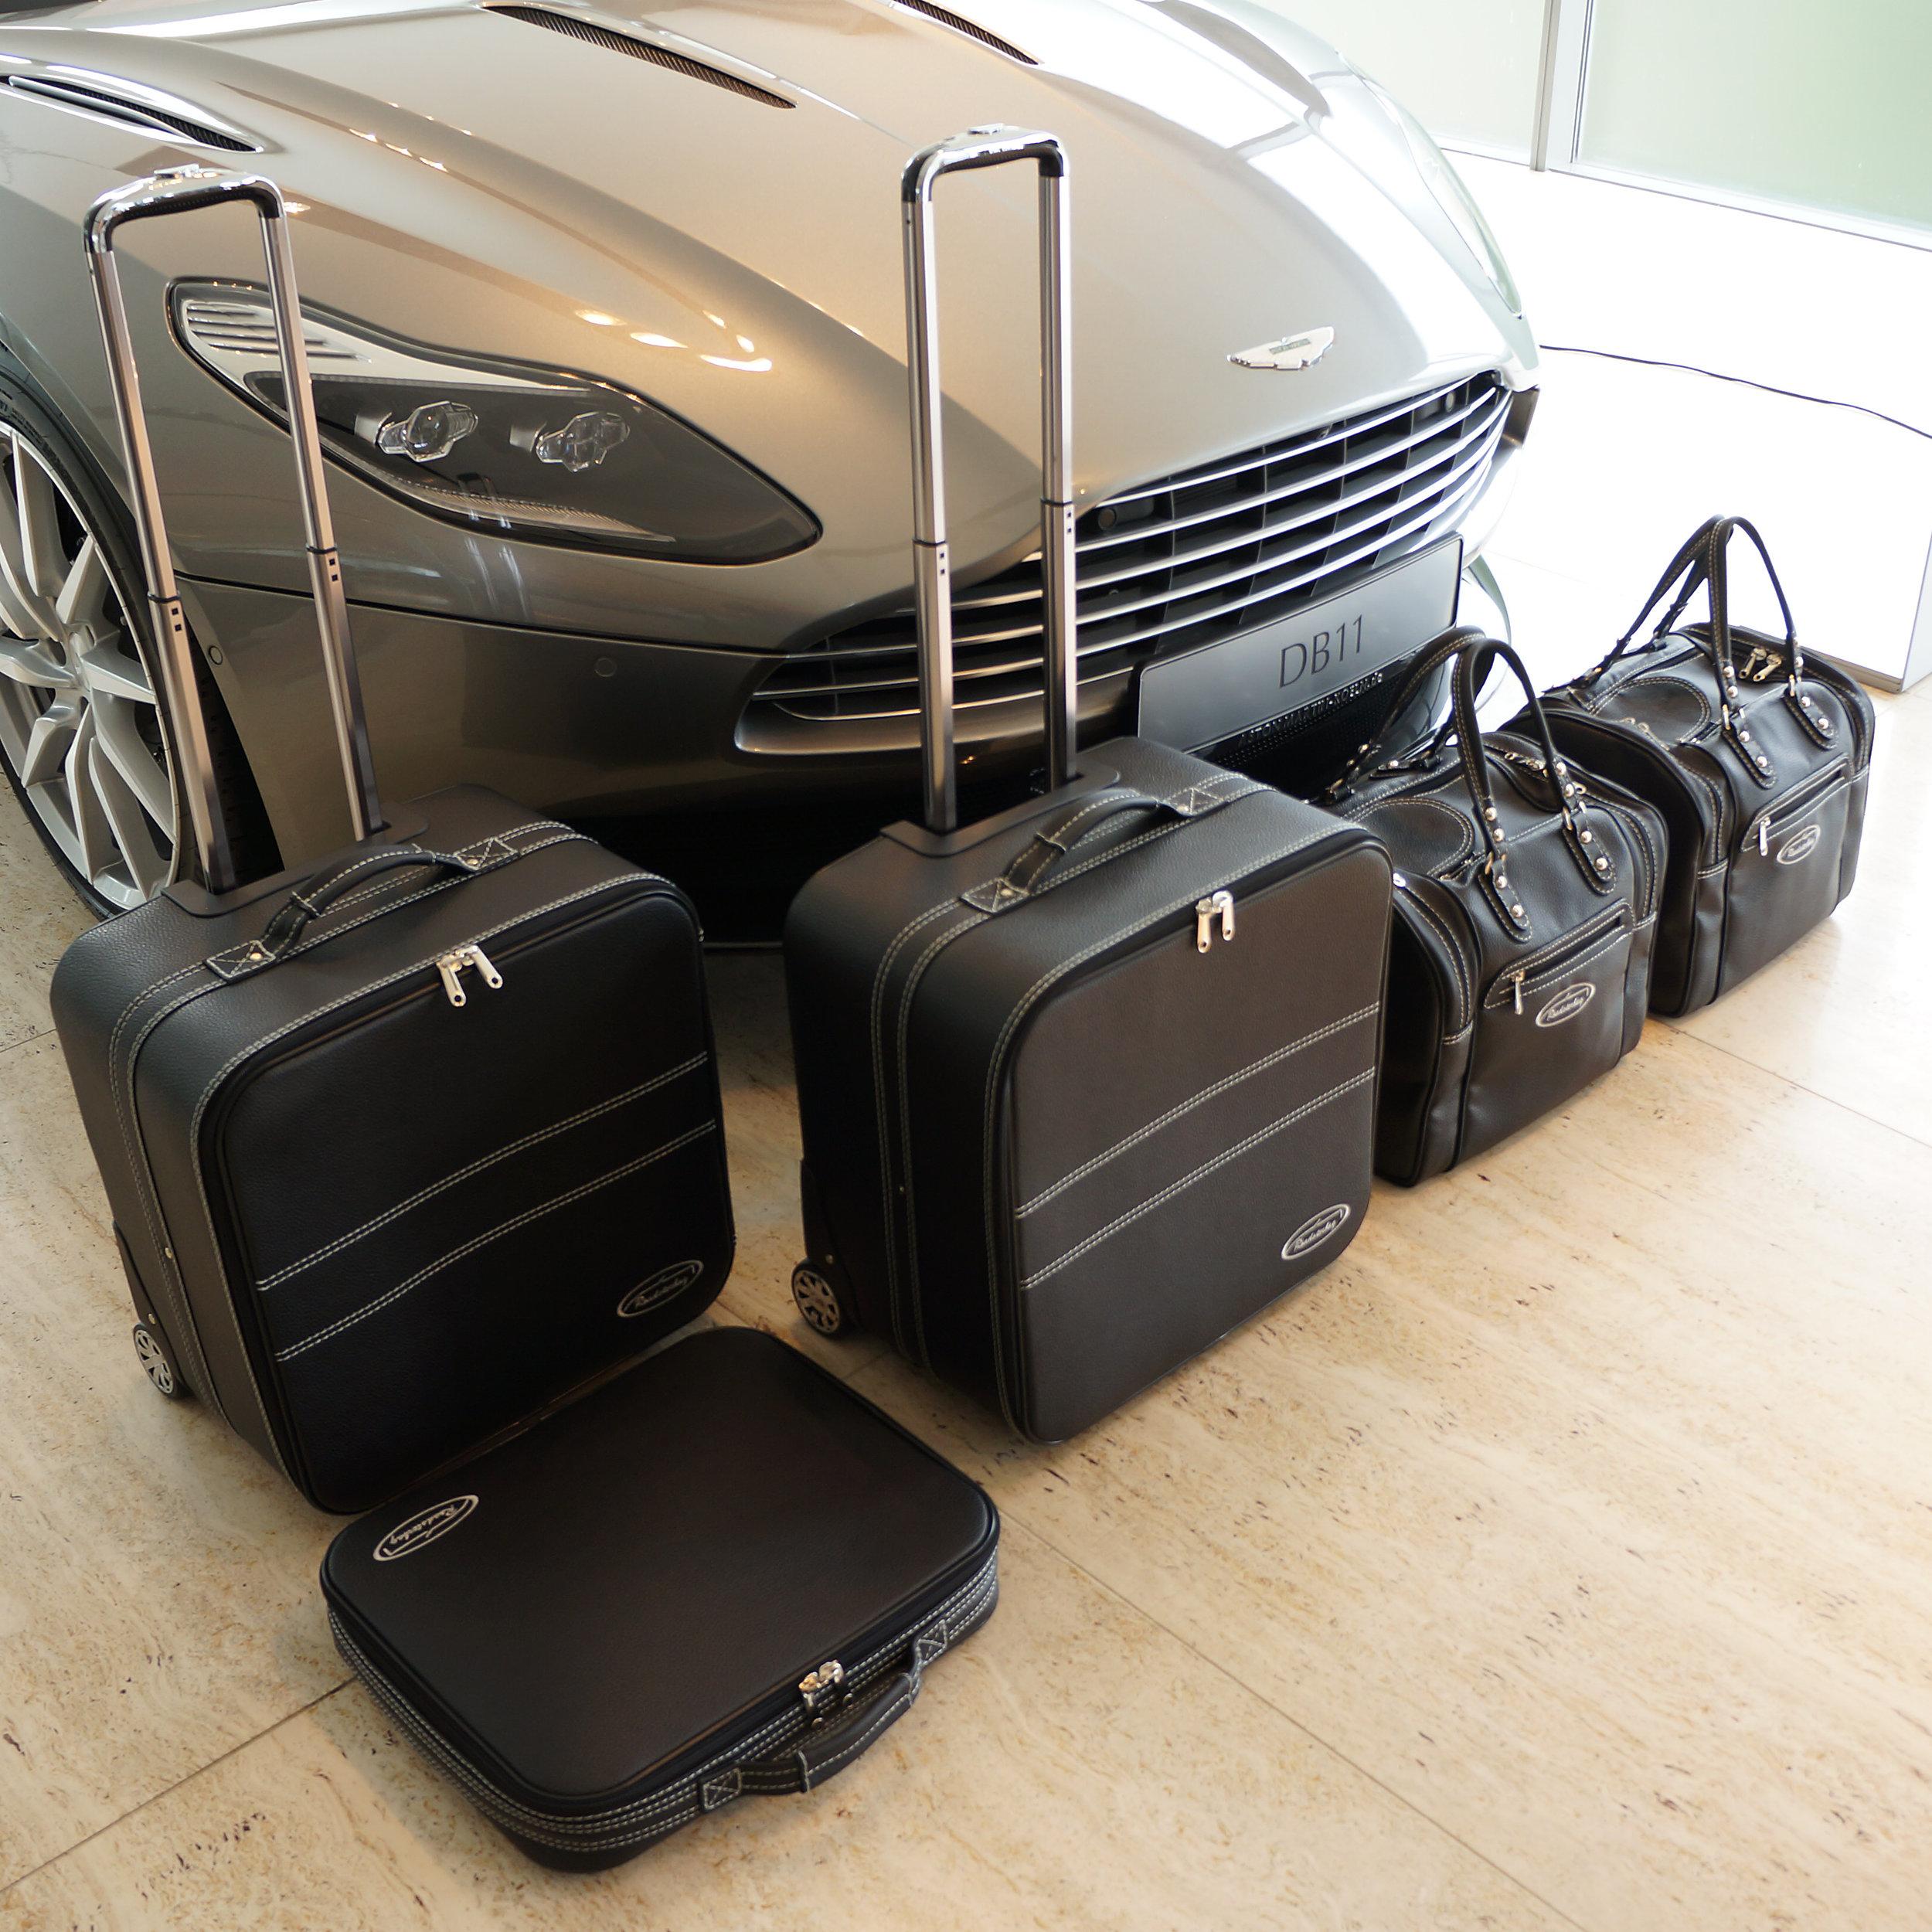 5-tlg. Kofferset mit 2 Rollen Aston Martin DB11 Coupé